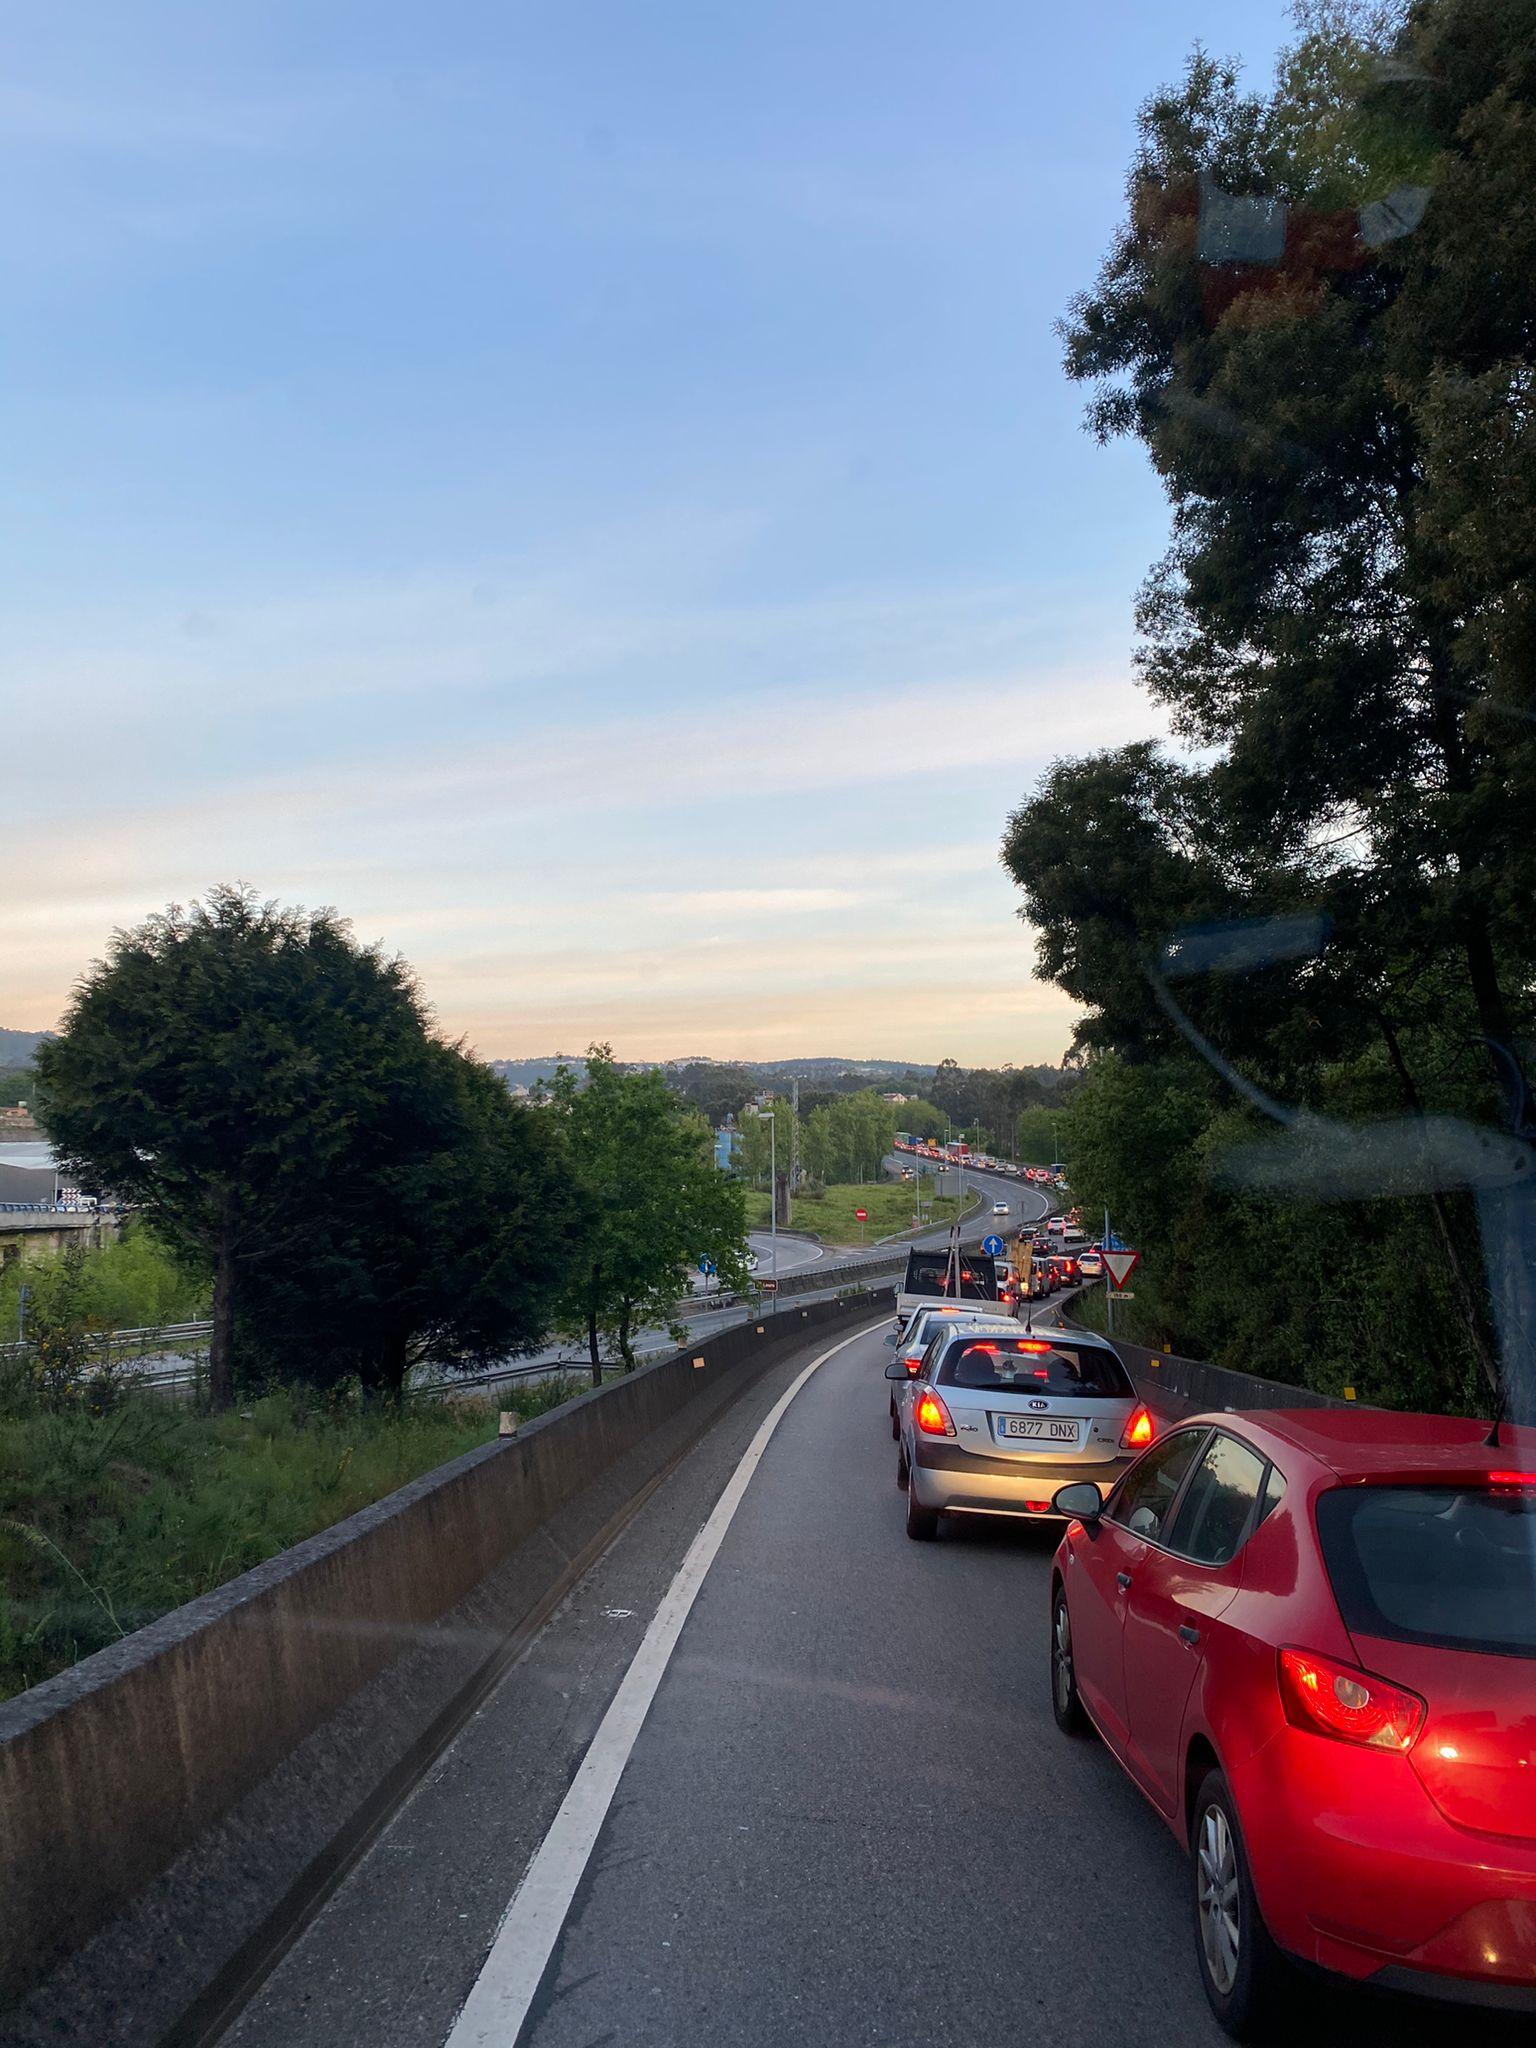 Accidnete en la Autovía A-55 Vigo-Porriño